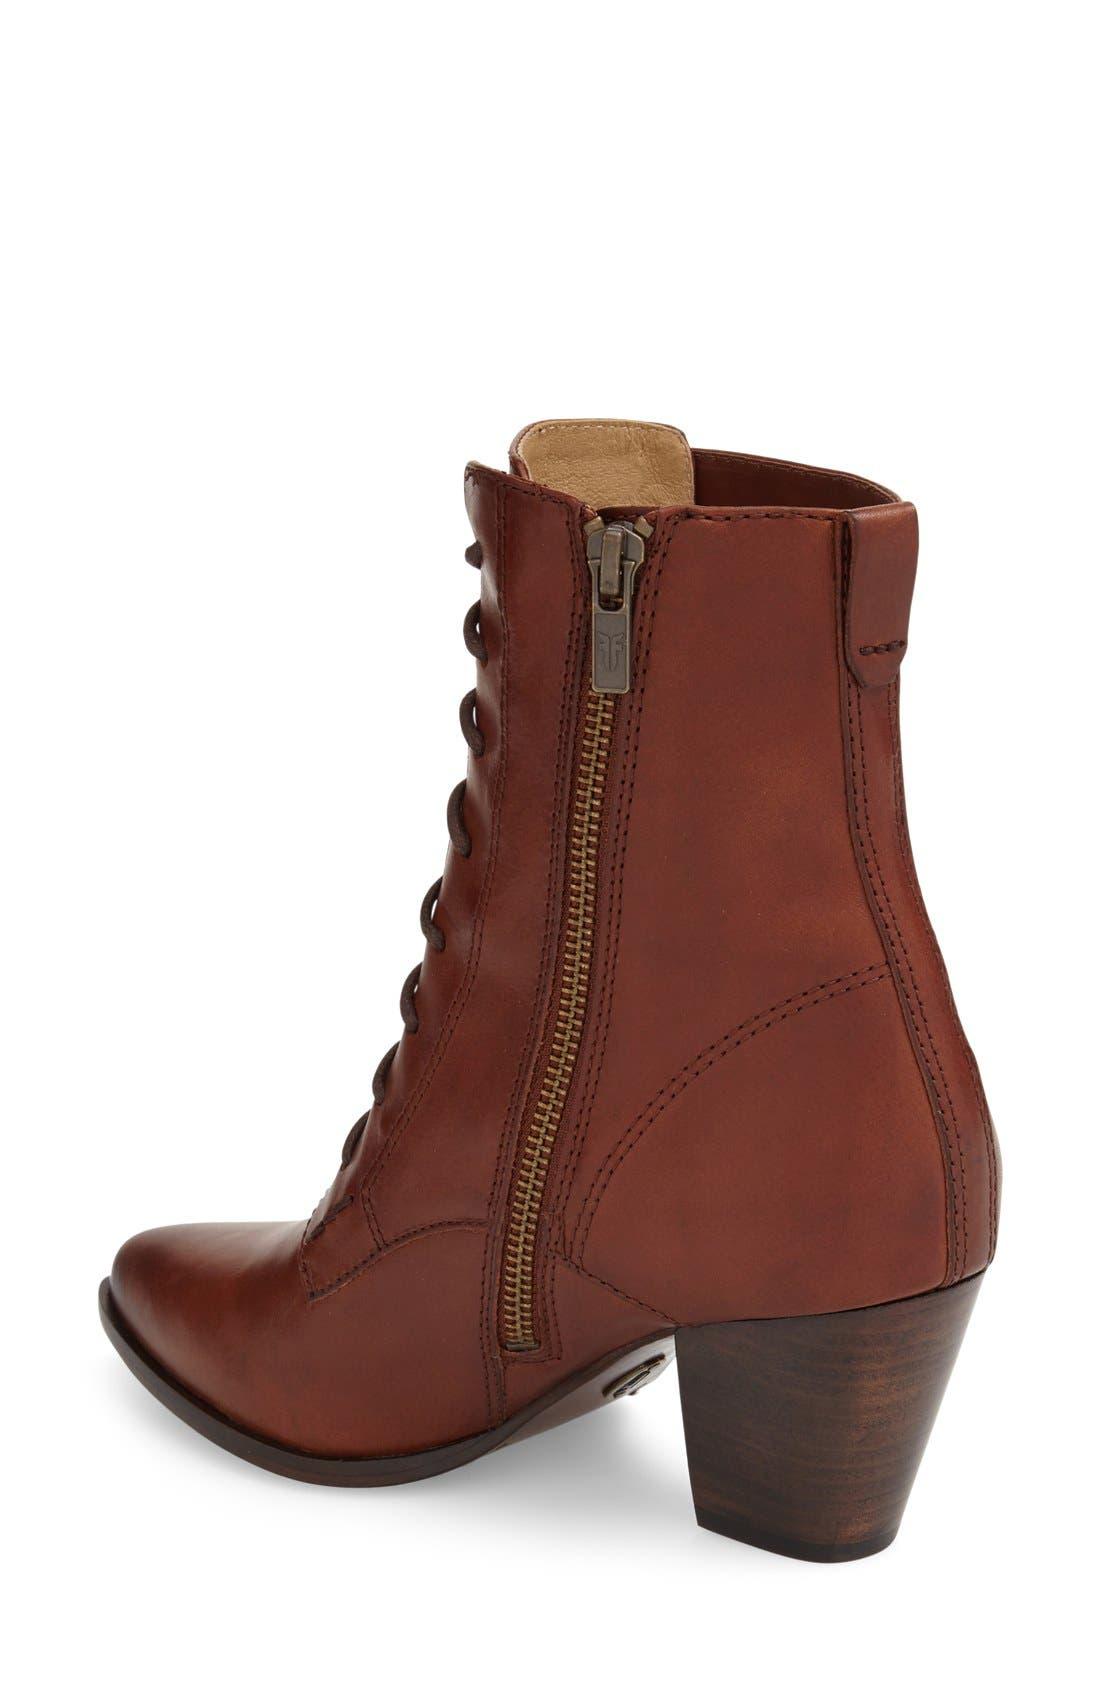 Alternate Image 2  - Frye 'Renee' Lace Up Boot (Women)